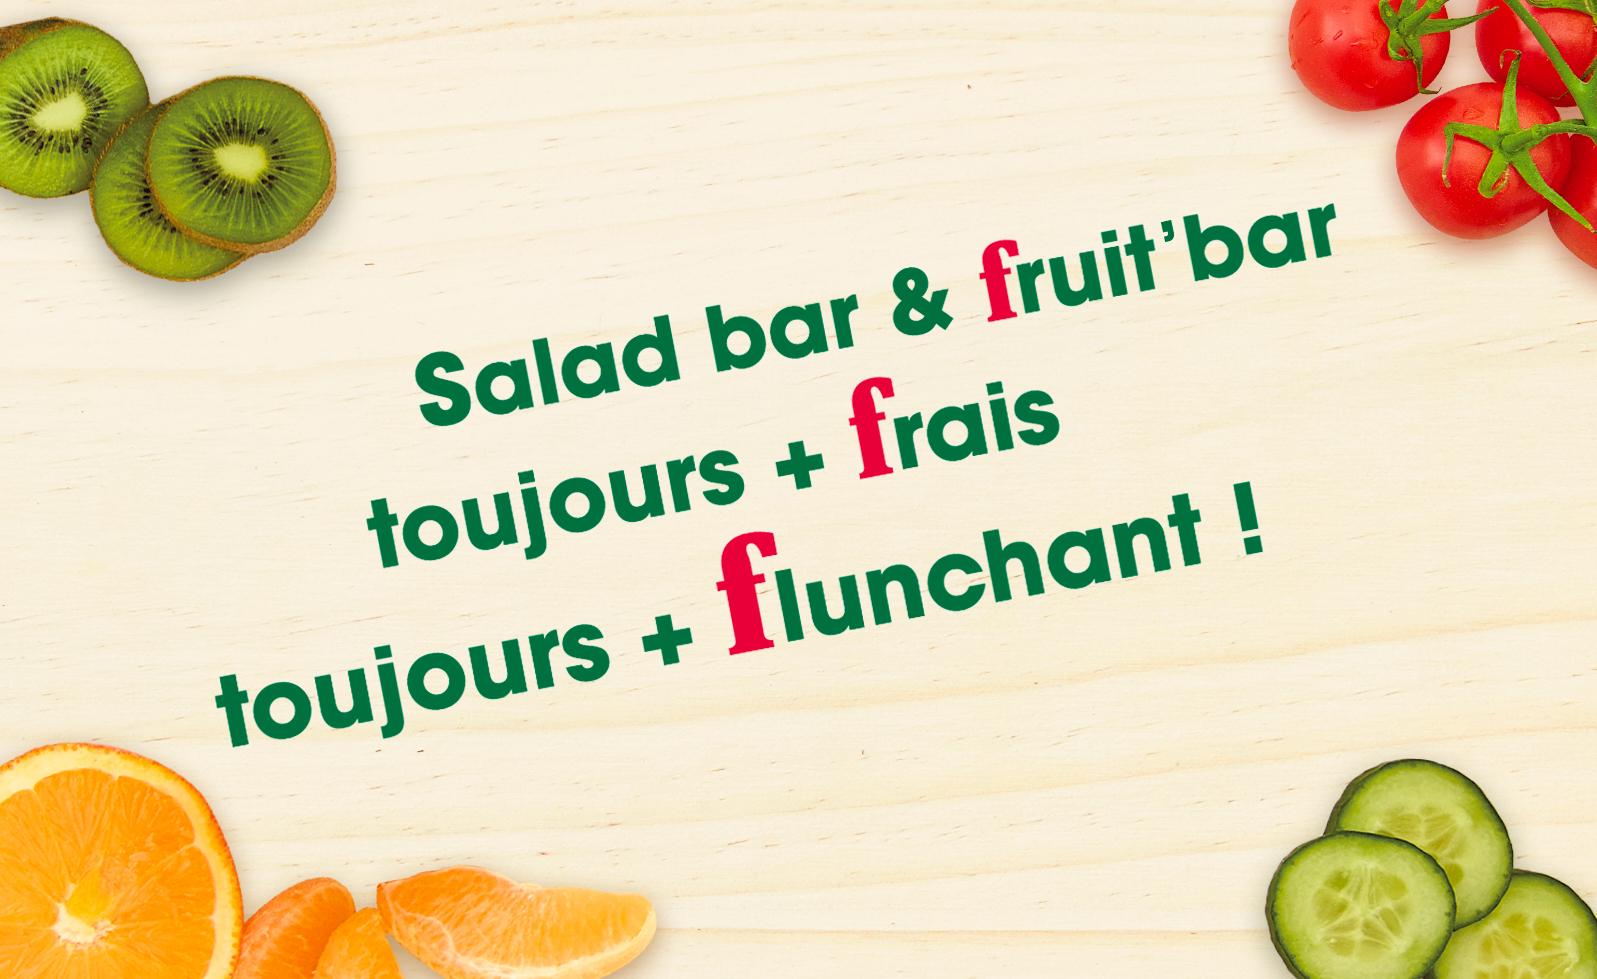 salad bar fruit bar flunch